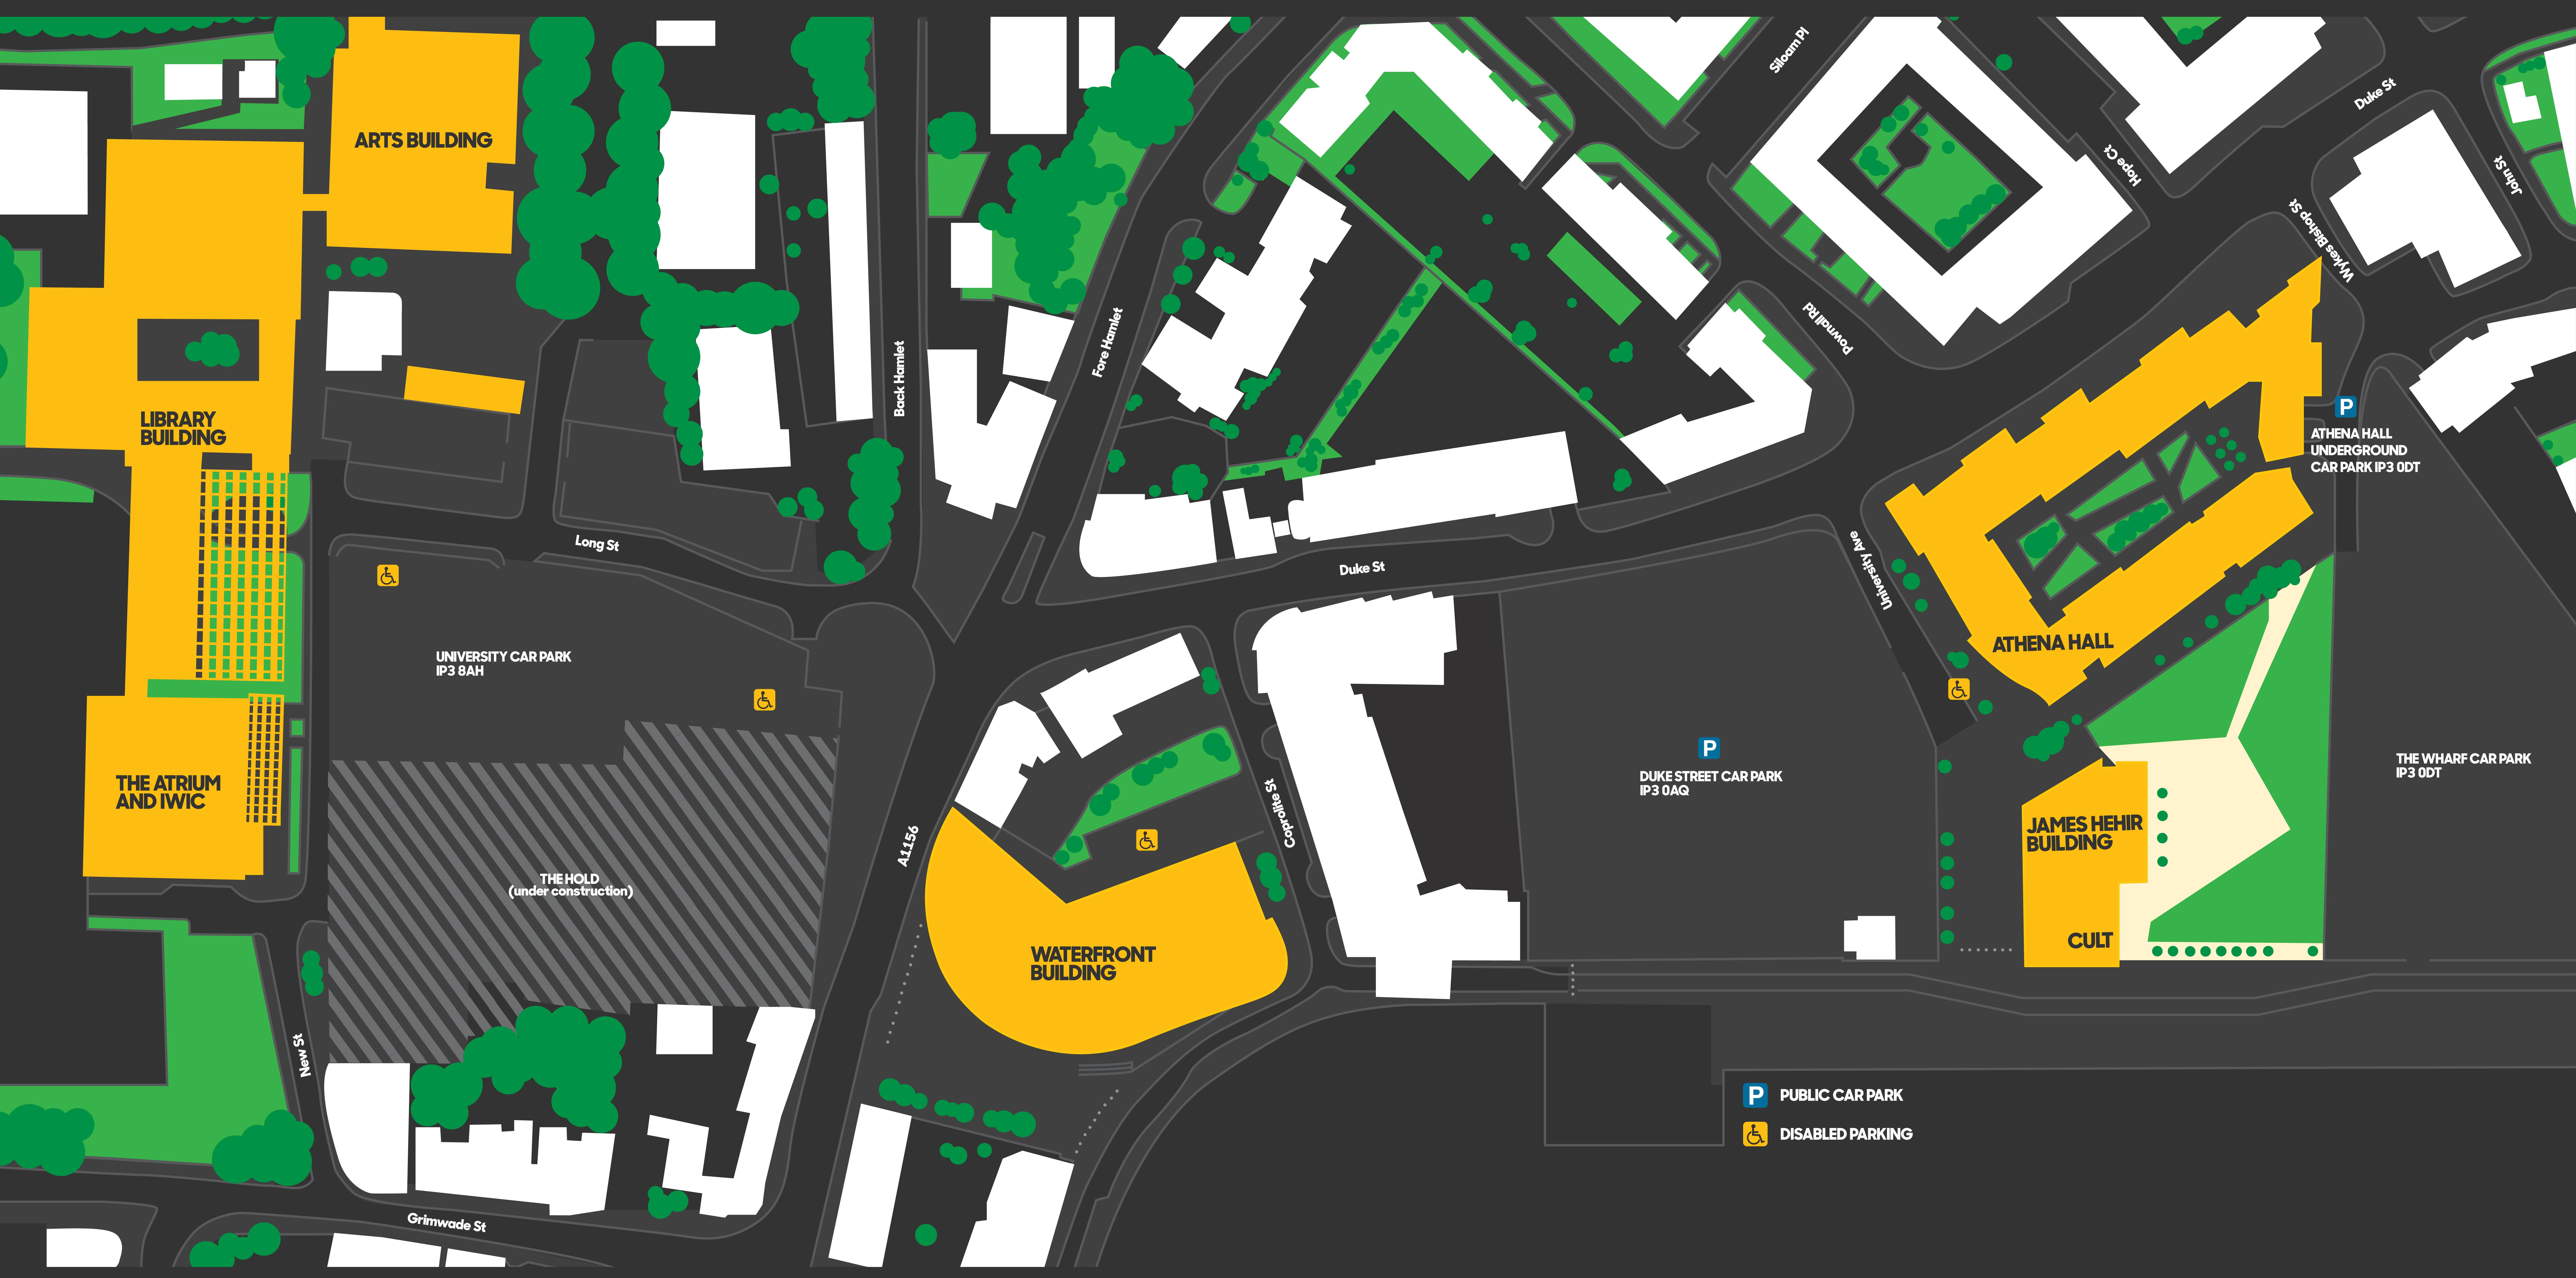 suffolk university campus map Waterfront Campus Map Rgb 01 Png University Of Suffolk suffolk university campus map